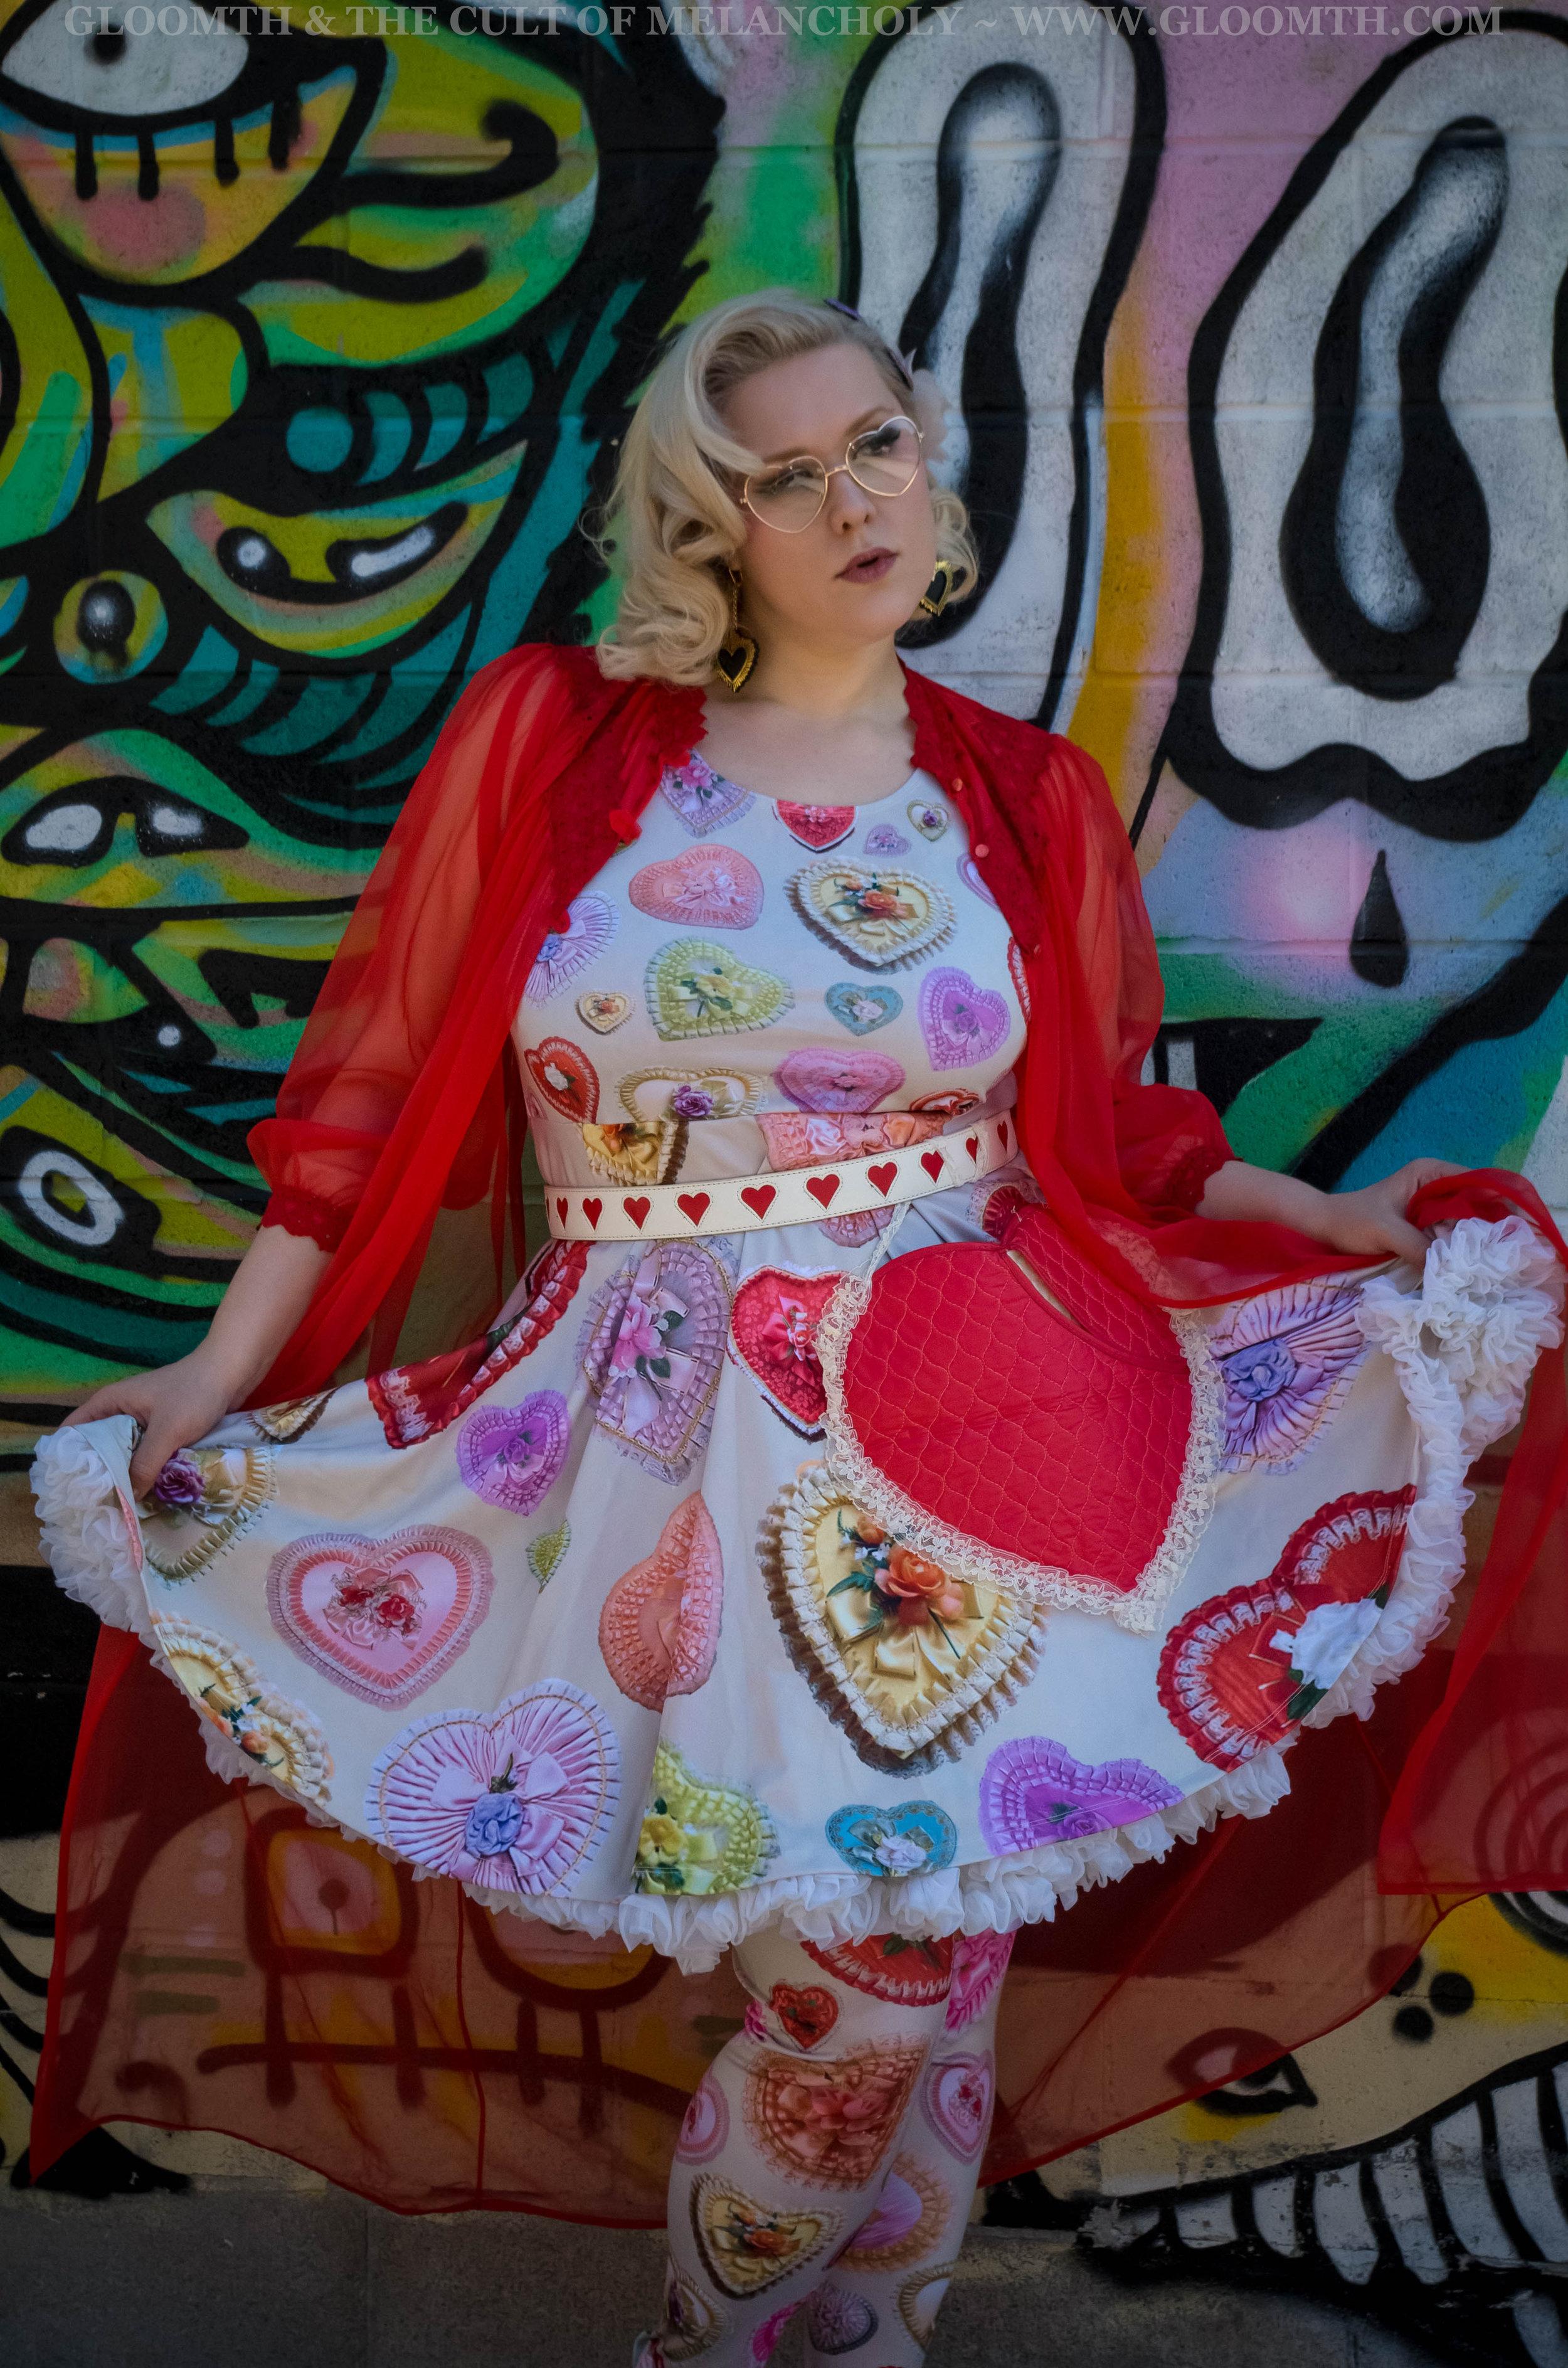 Vintage Valentine Print Fit and Flare Dress — Gloomth